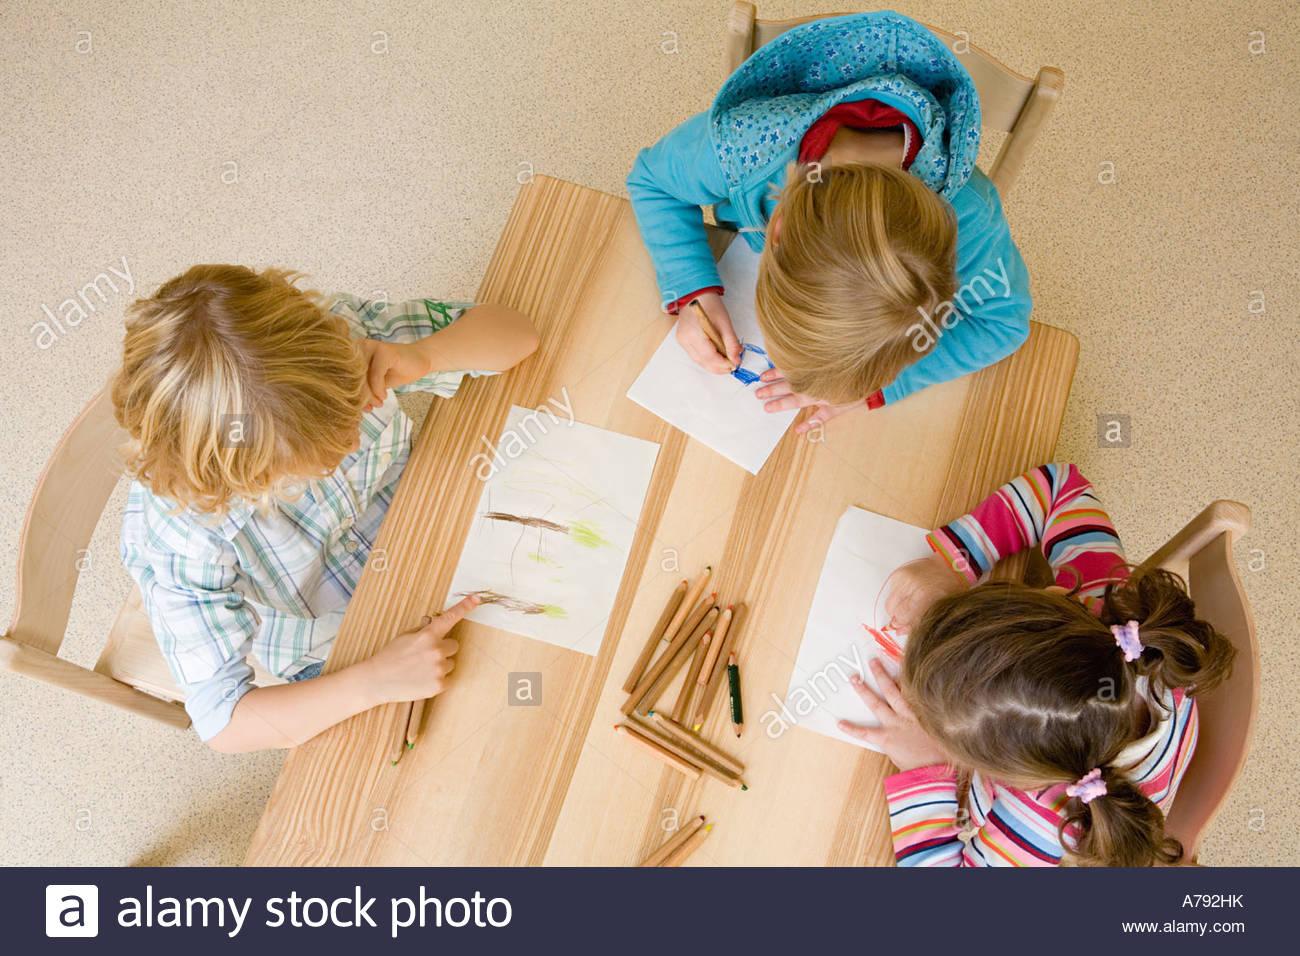 Children drawing - Stock Image